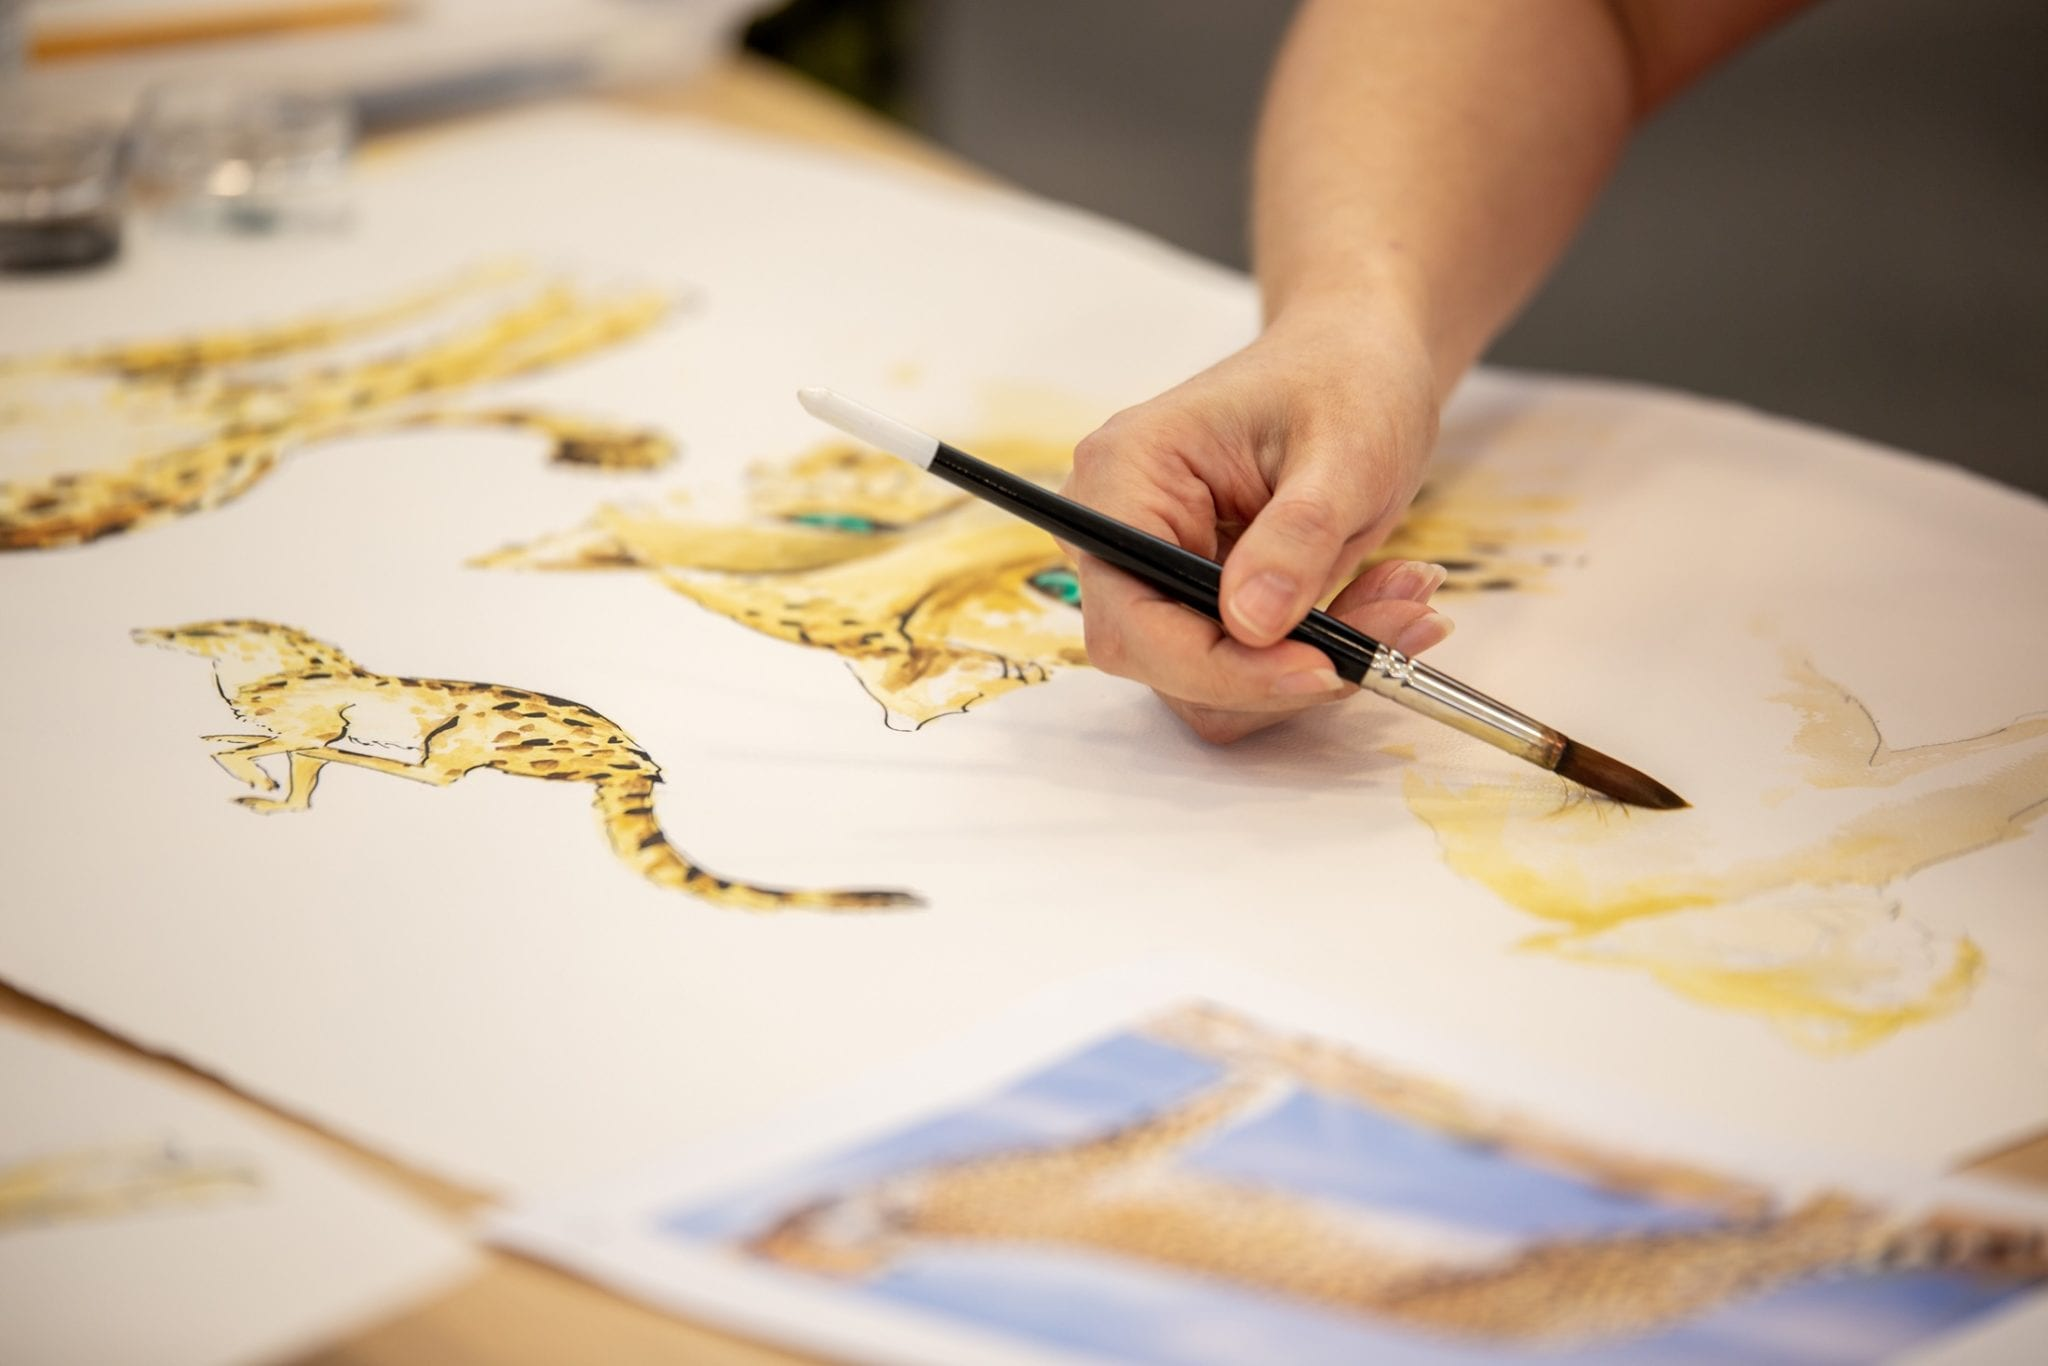 Fabric design department, fabrics, artwork on fabrics, textiles